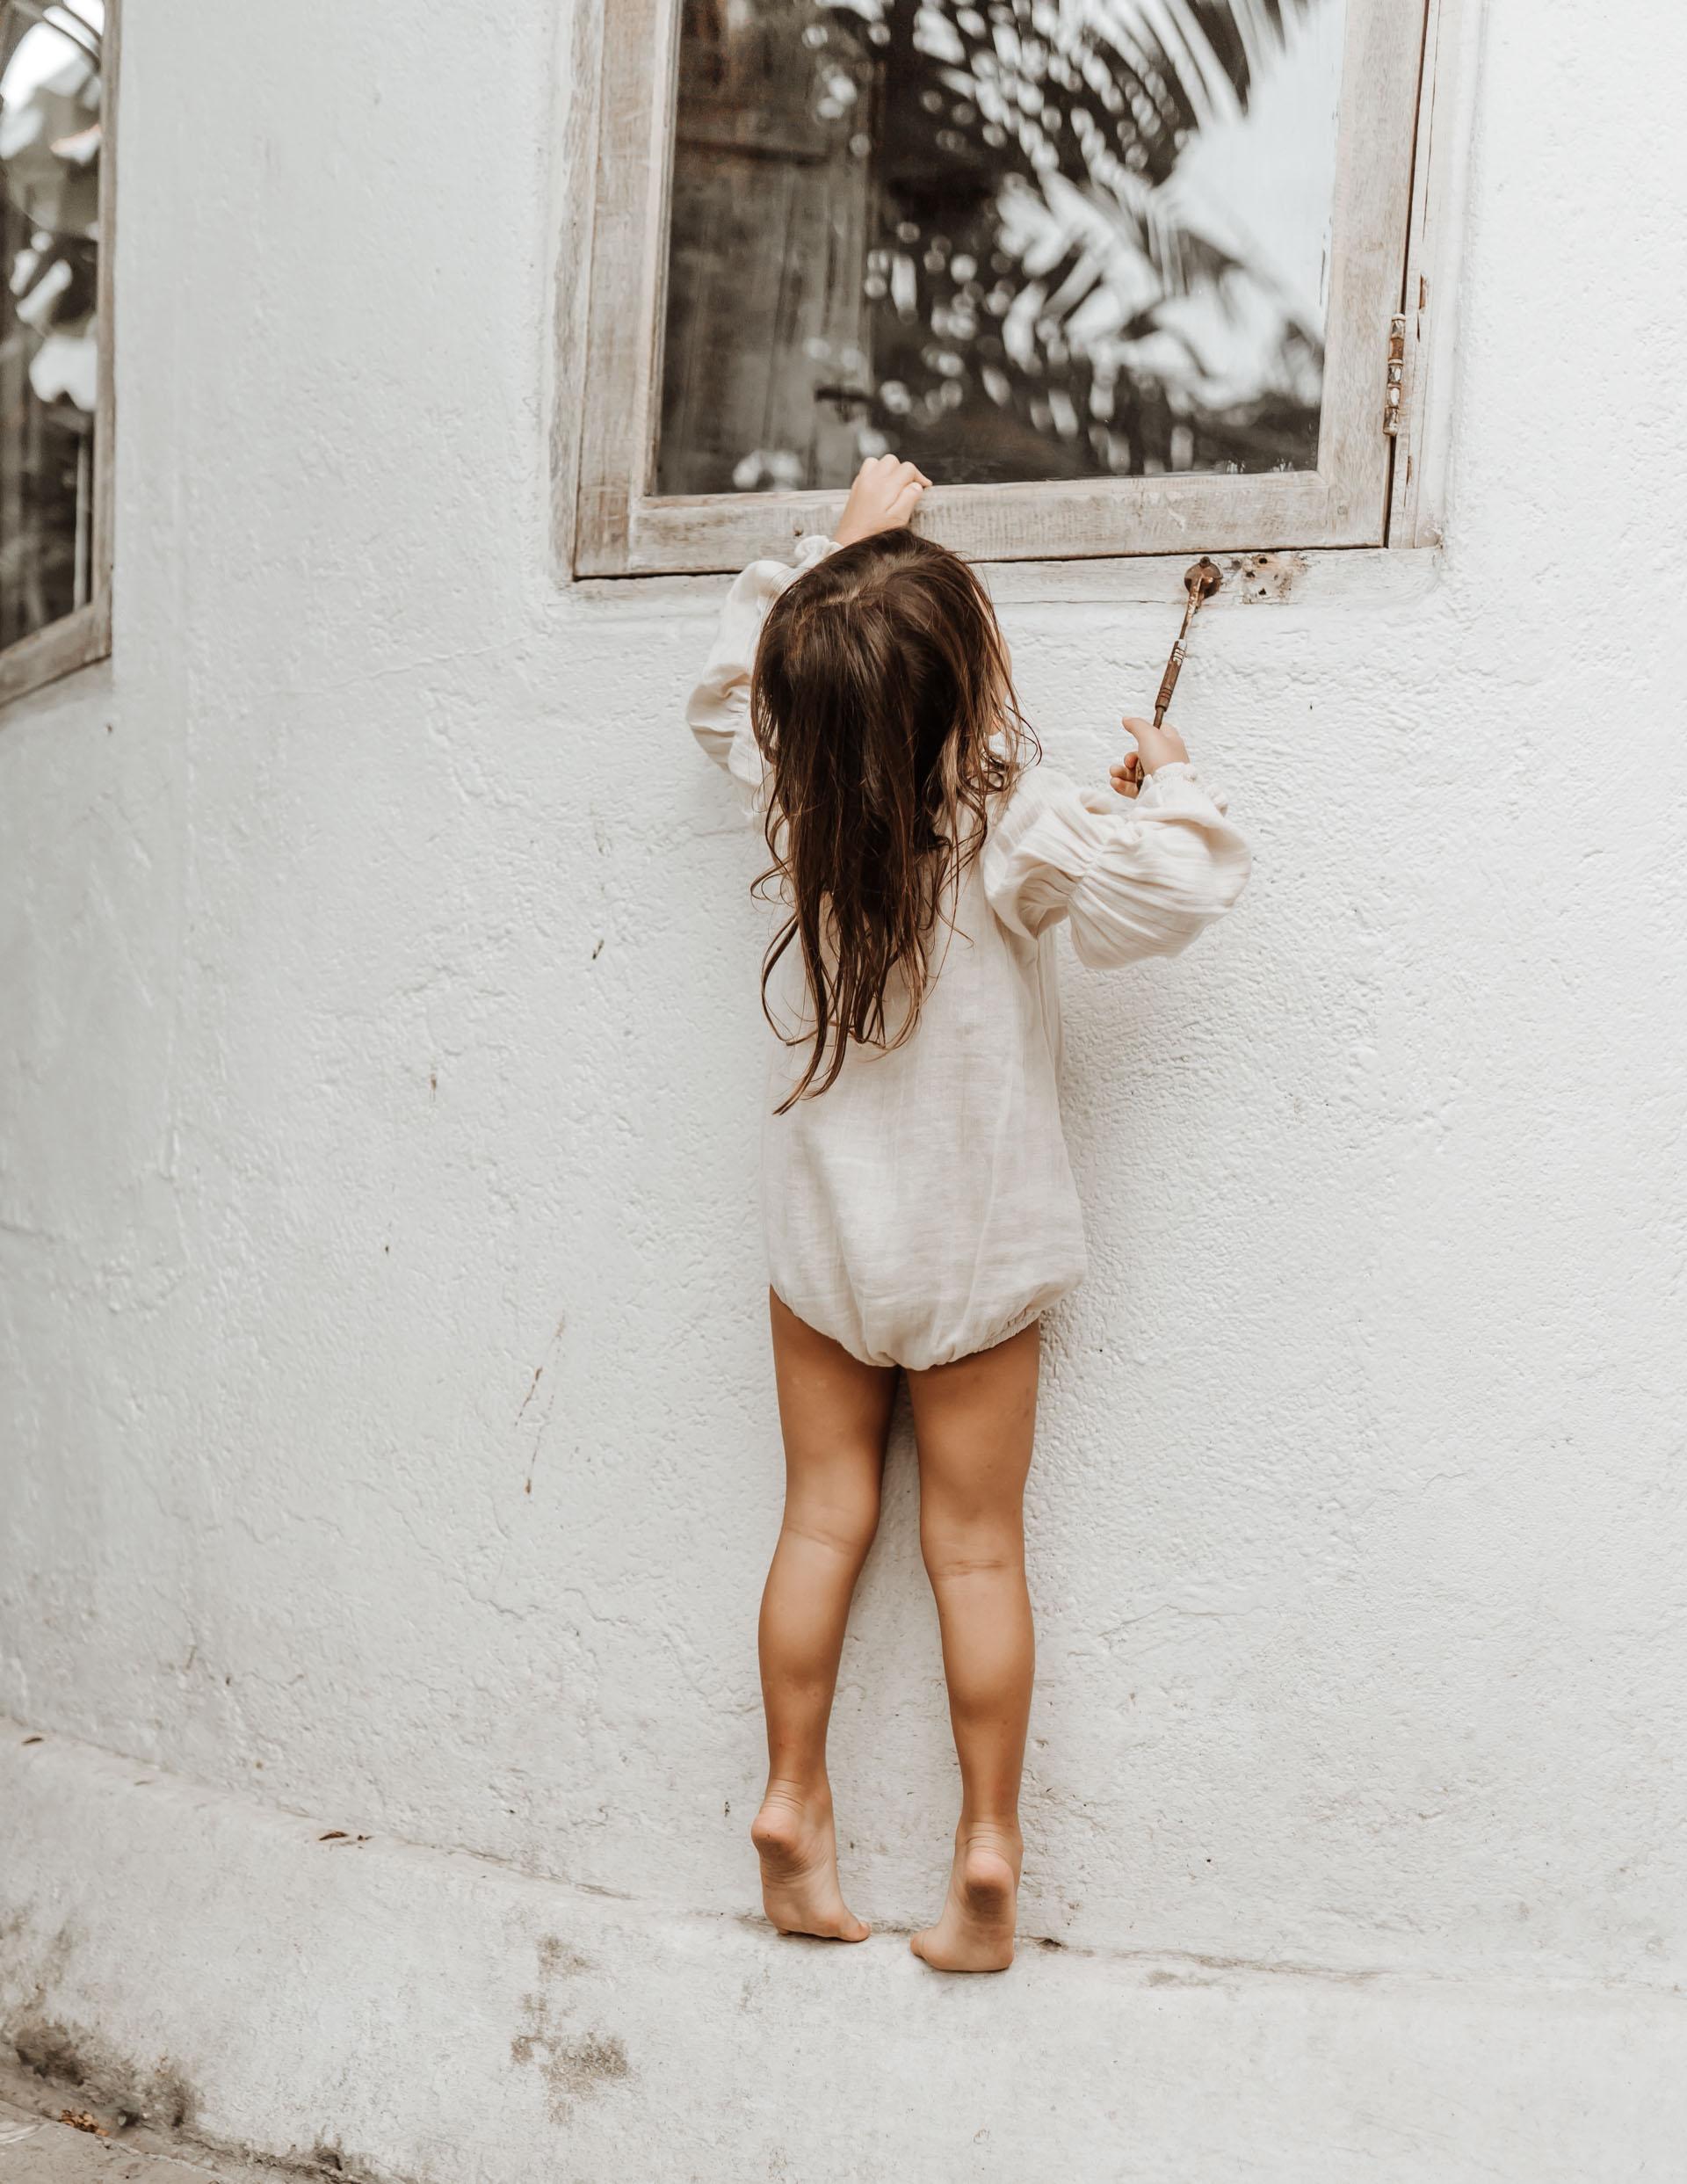 keira-mason-illoura-the-label-girl-reaching-for-window.jpg